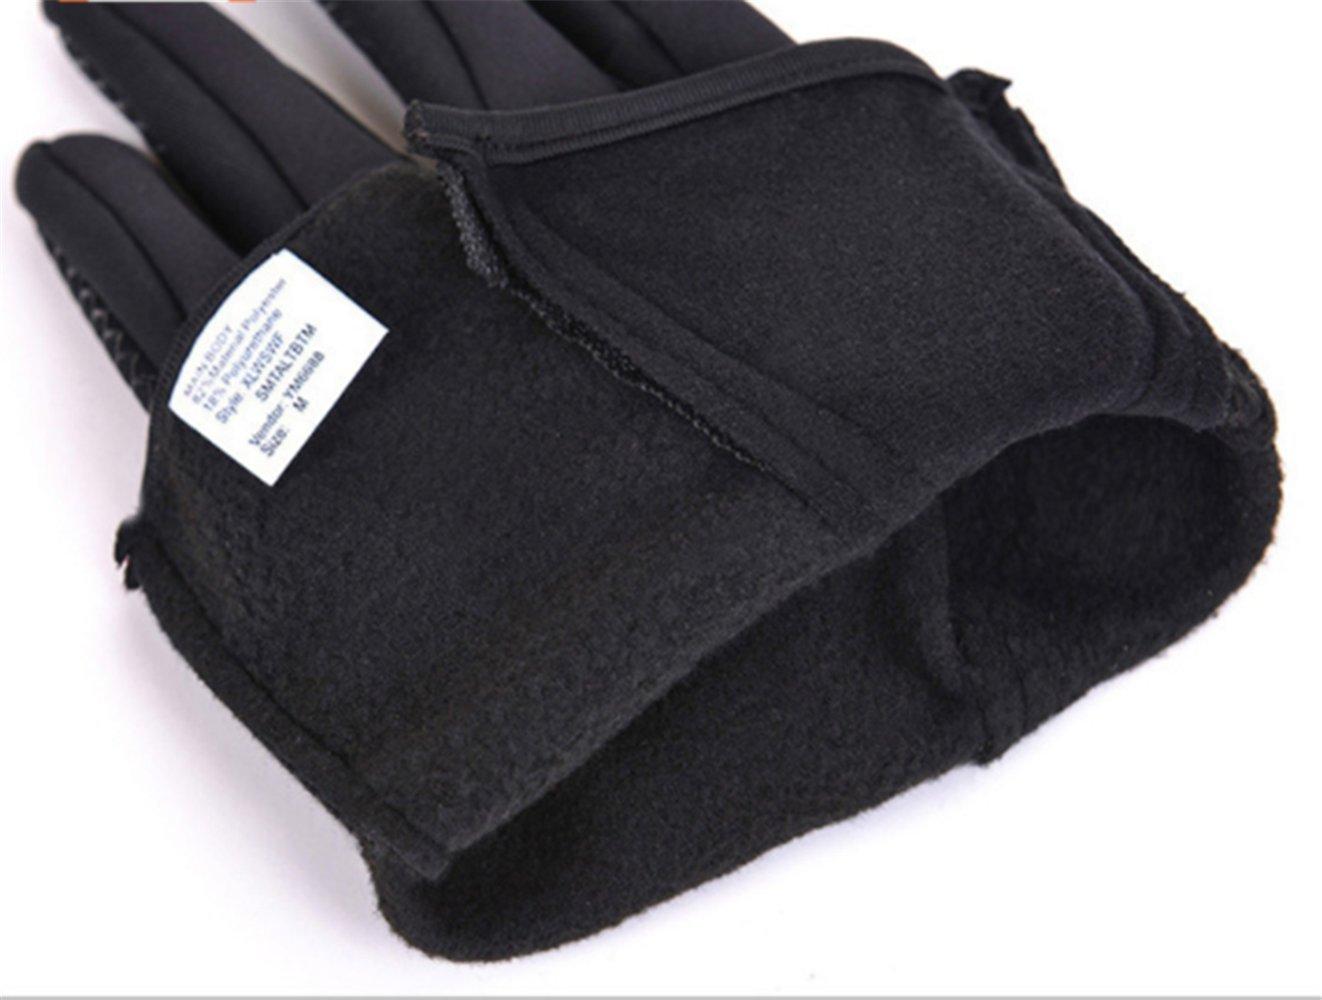 Waterproof Touchscreen Cycling Gloves Winter Warm Full Finger Outdoor Ski Snow Bike Women Men Adjustable Size Glove for Smart Phone,Black,M /Plam width:3.14in by HILEELANG (Image #6)